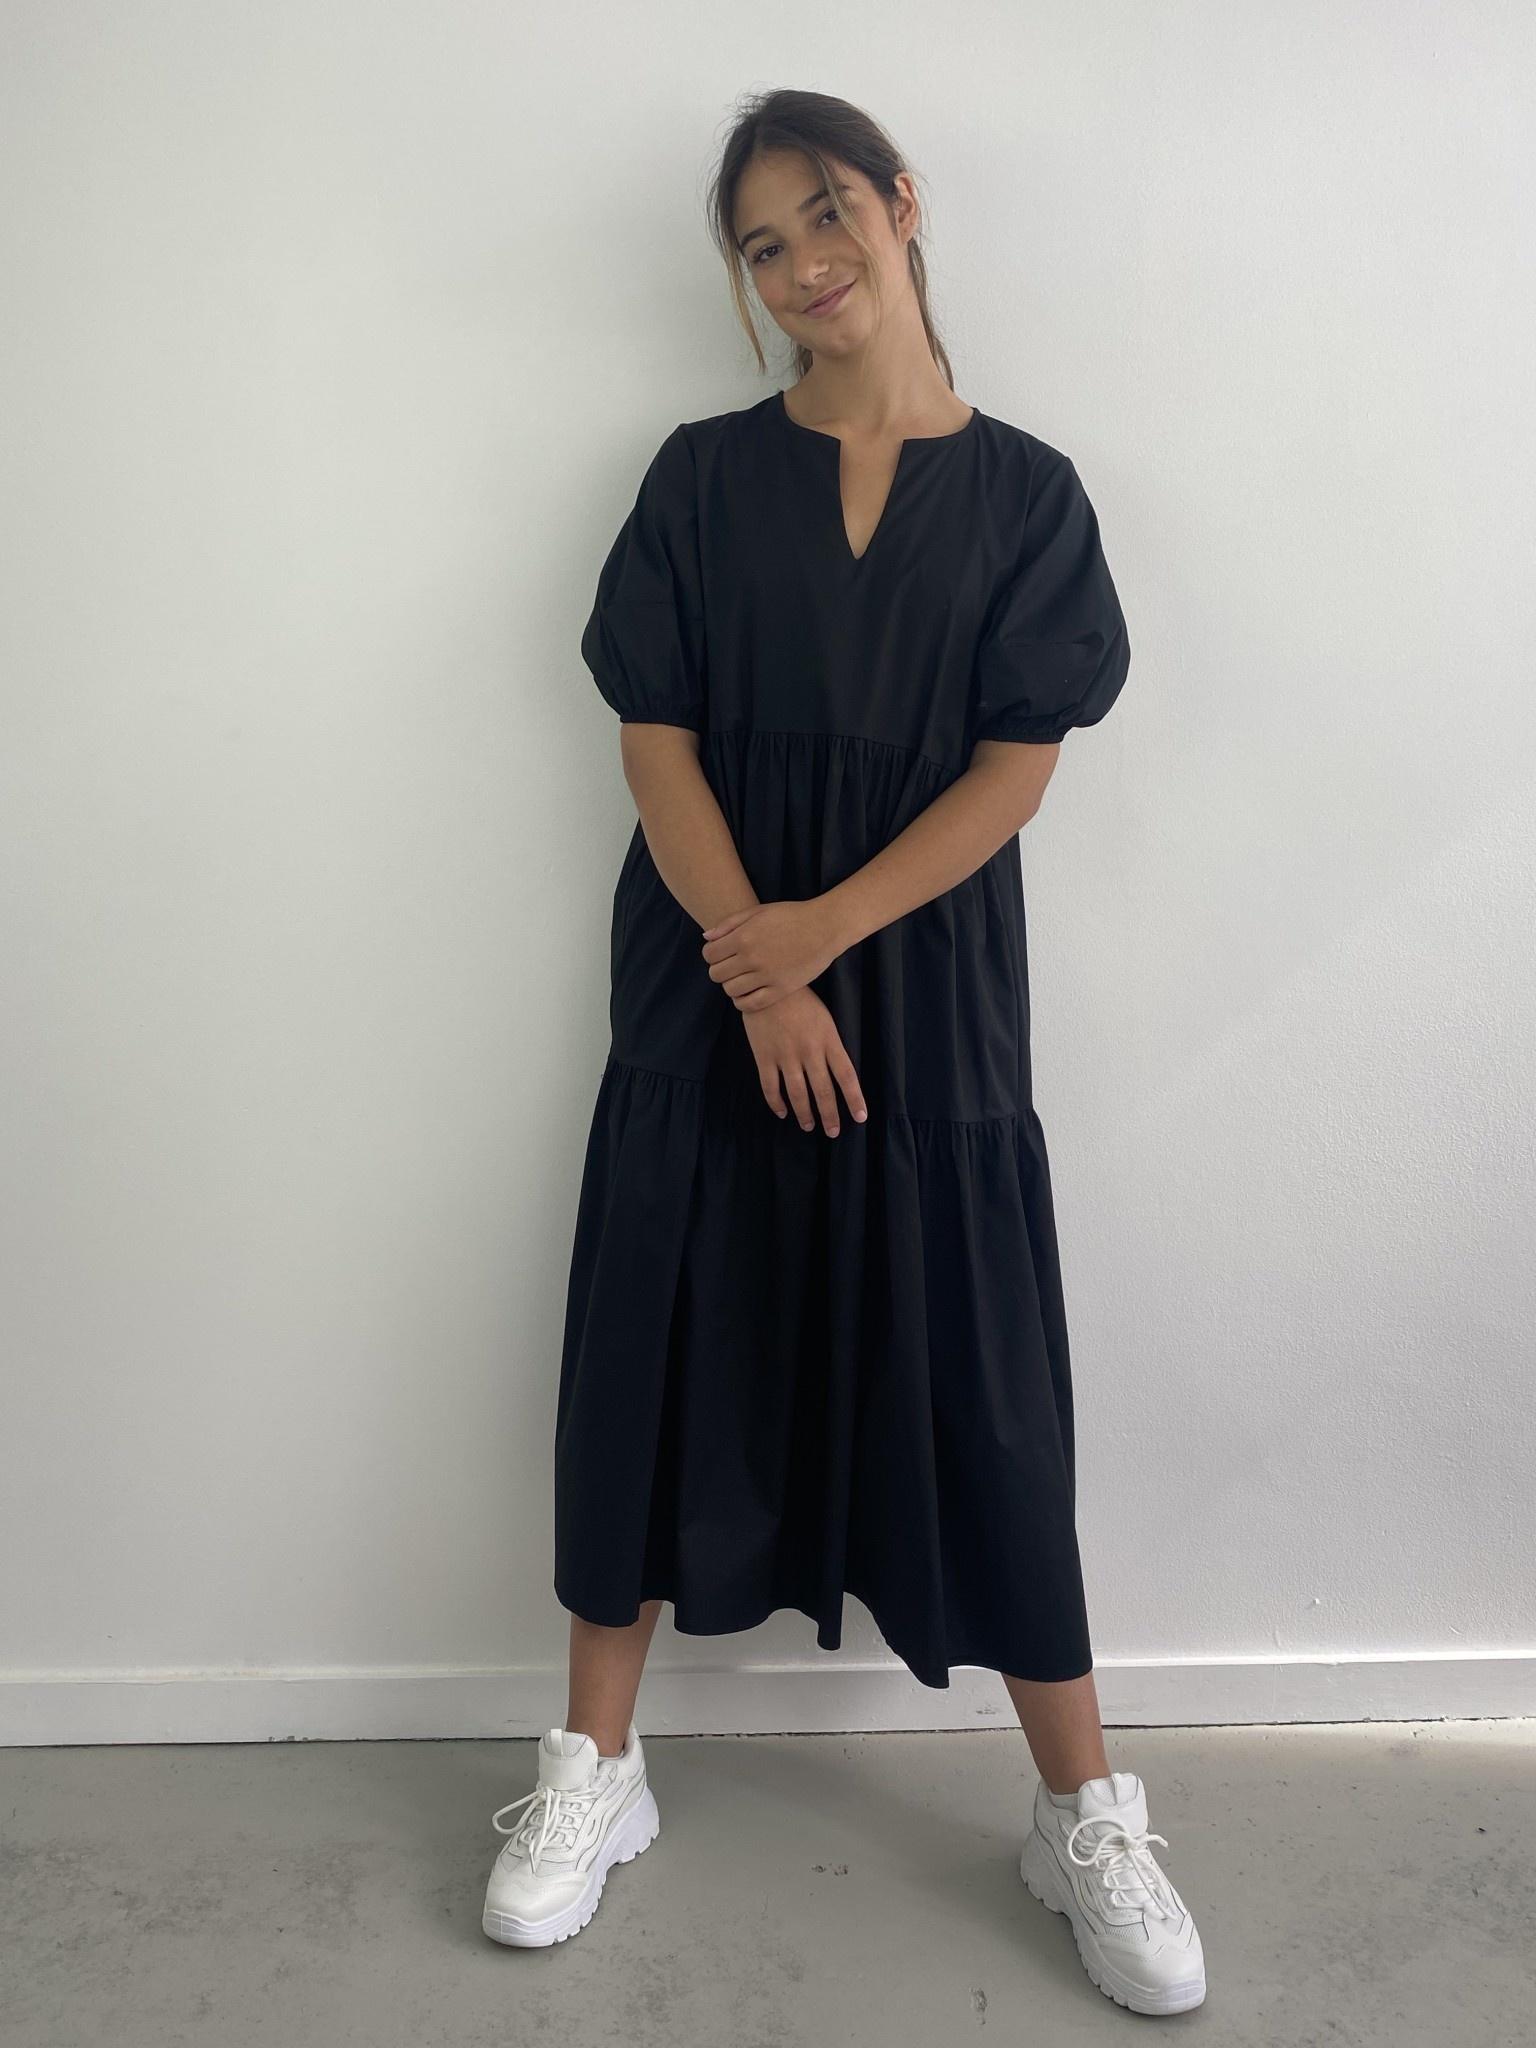 Jovie urban dress Black-3